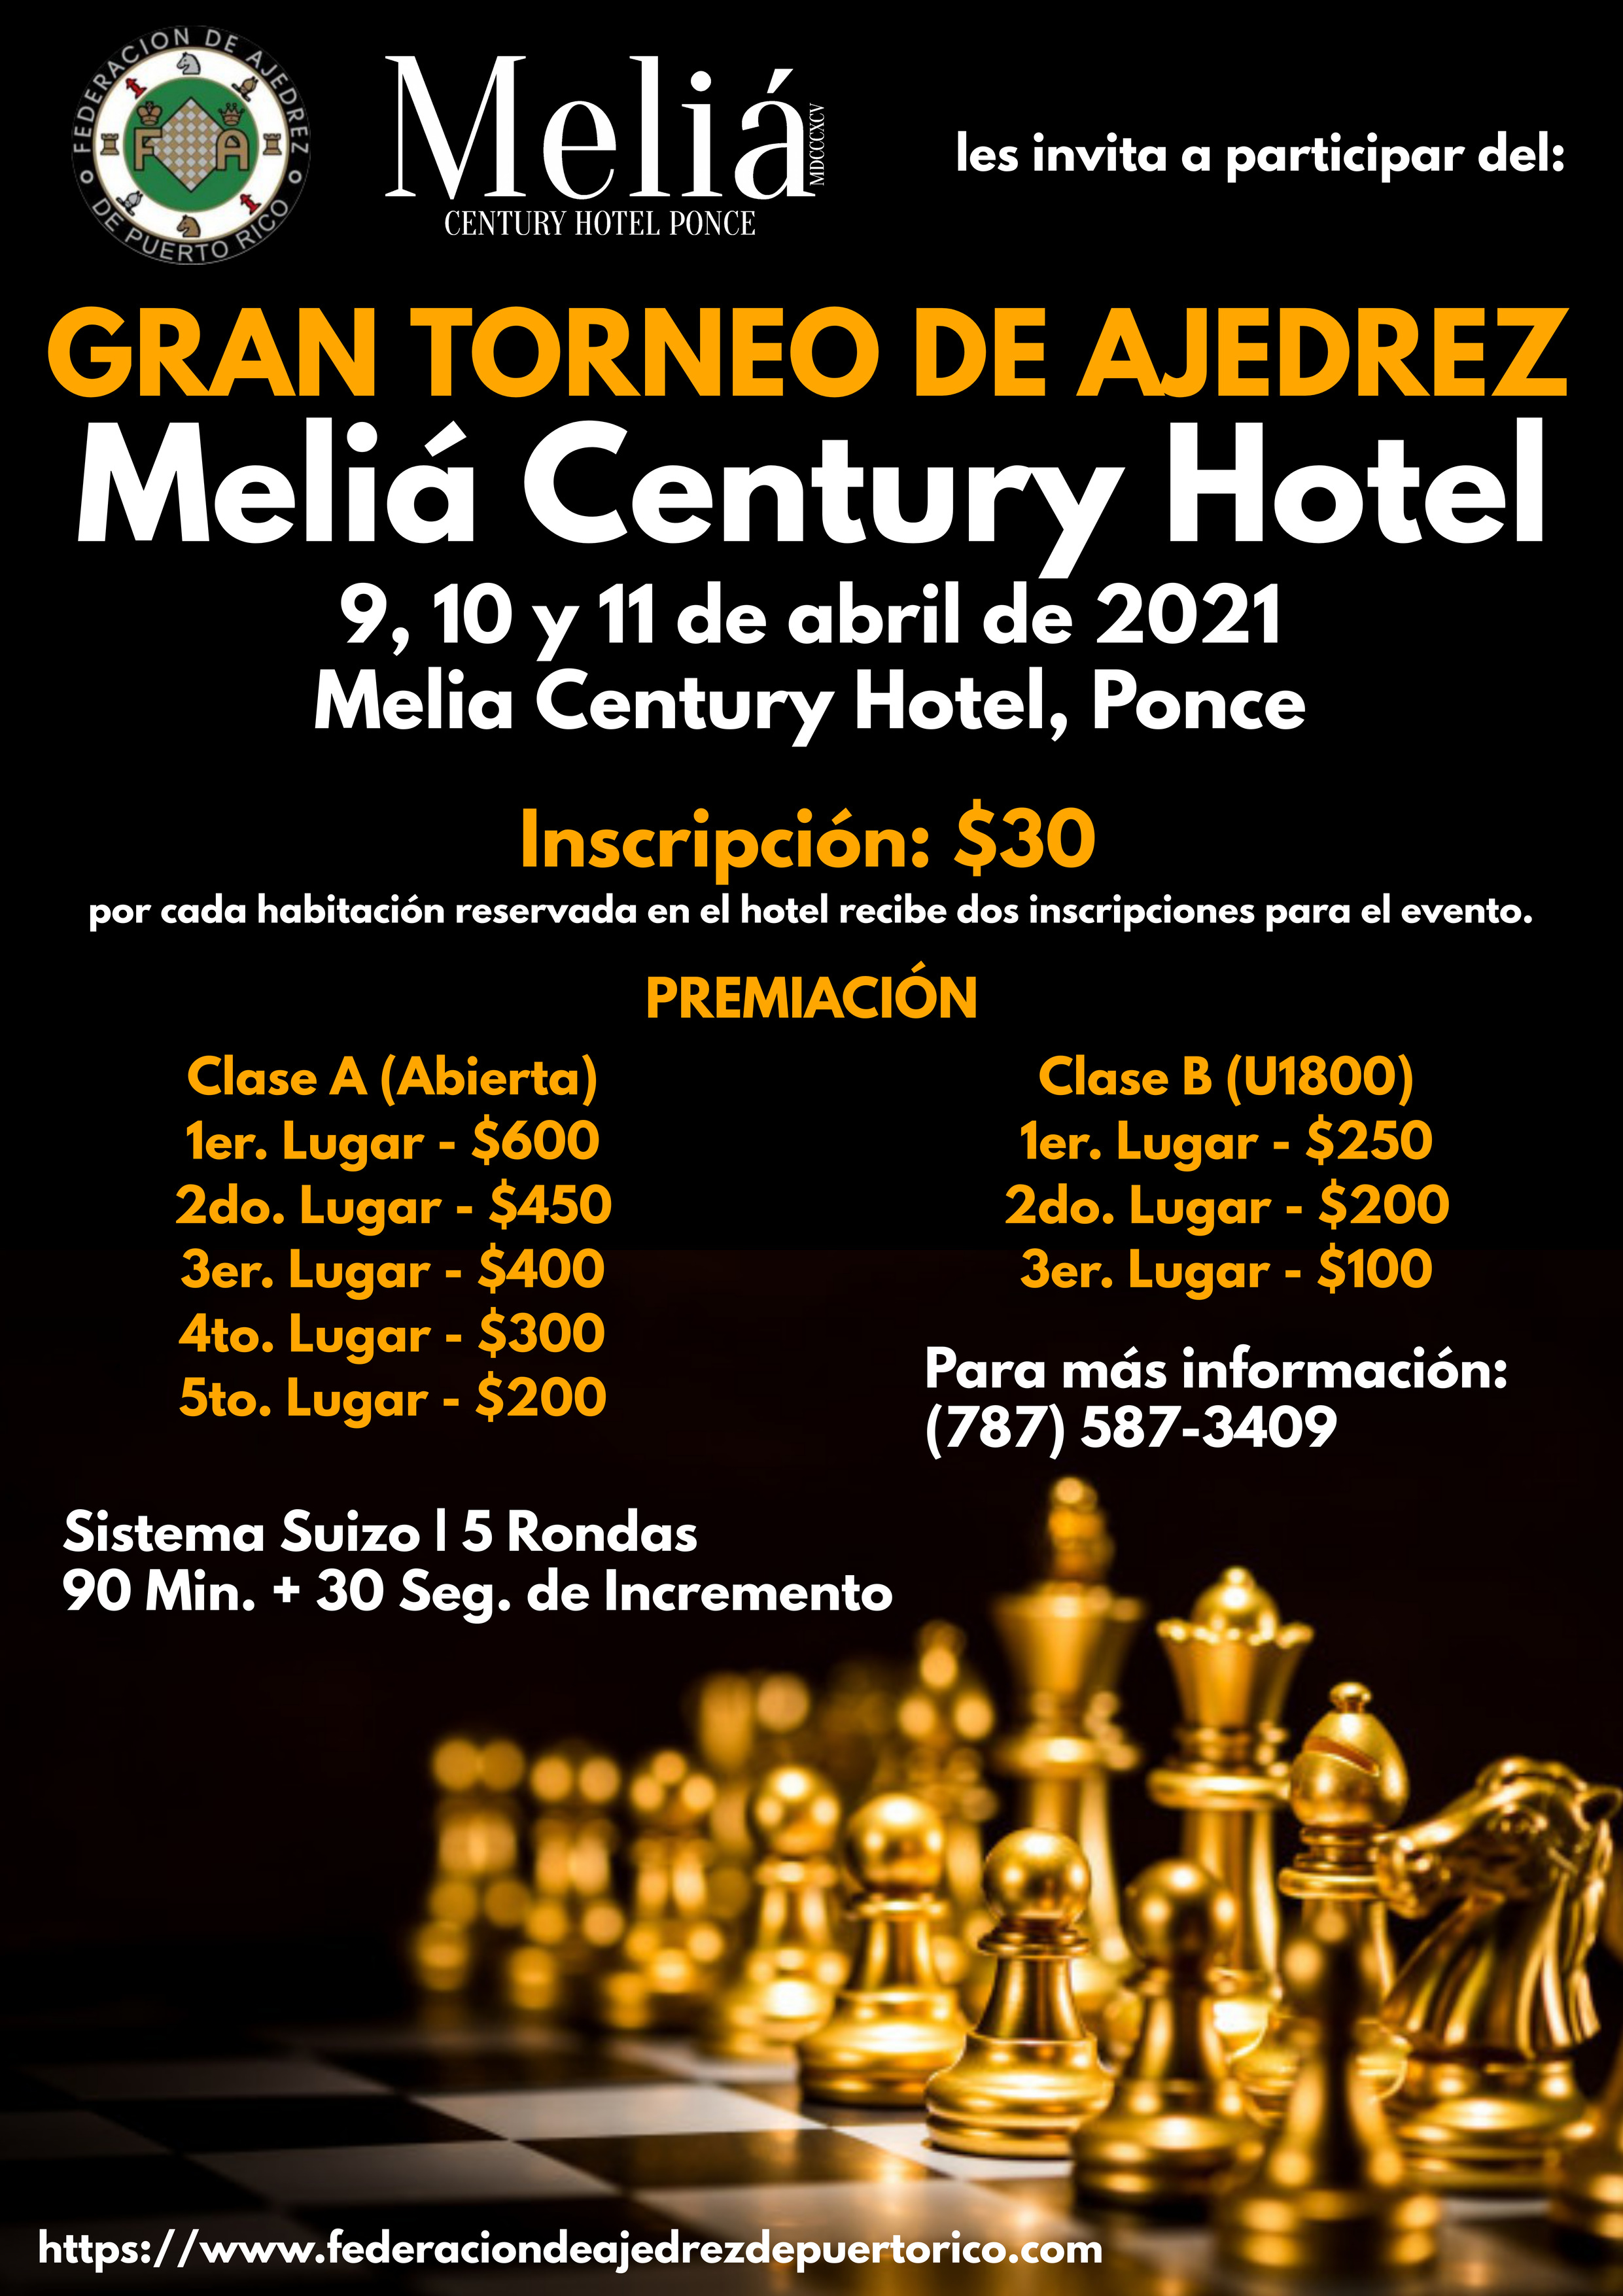 Gran Torneo de Ajedrez Melia Century Hot